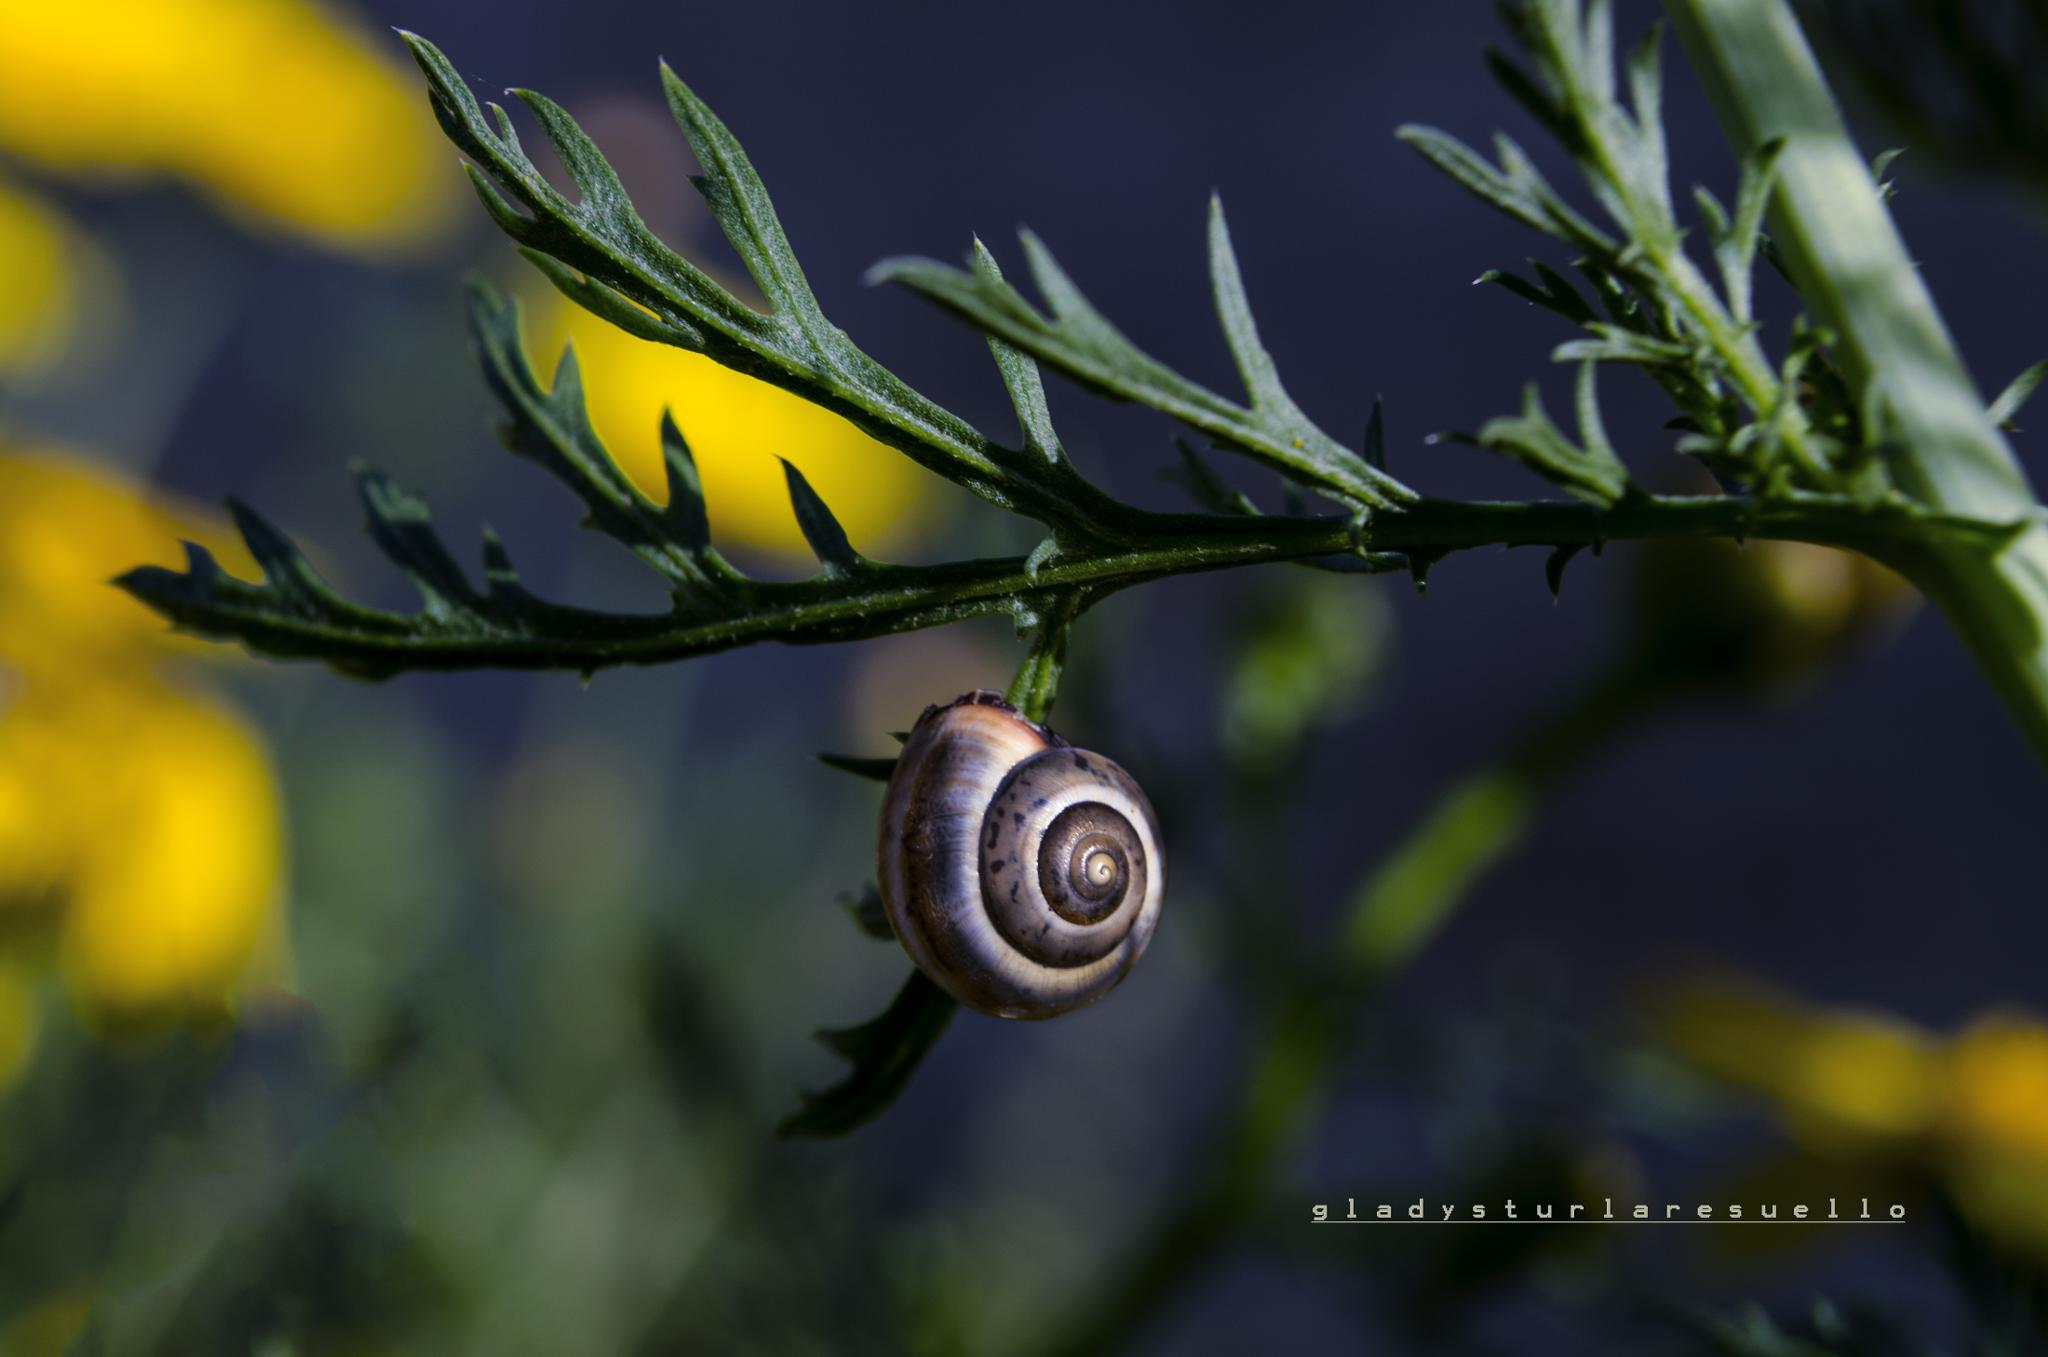 HANG ON! by tresuellogladz